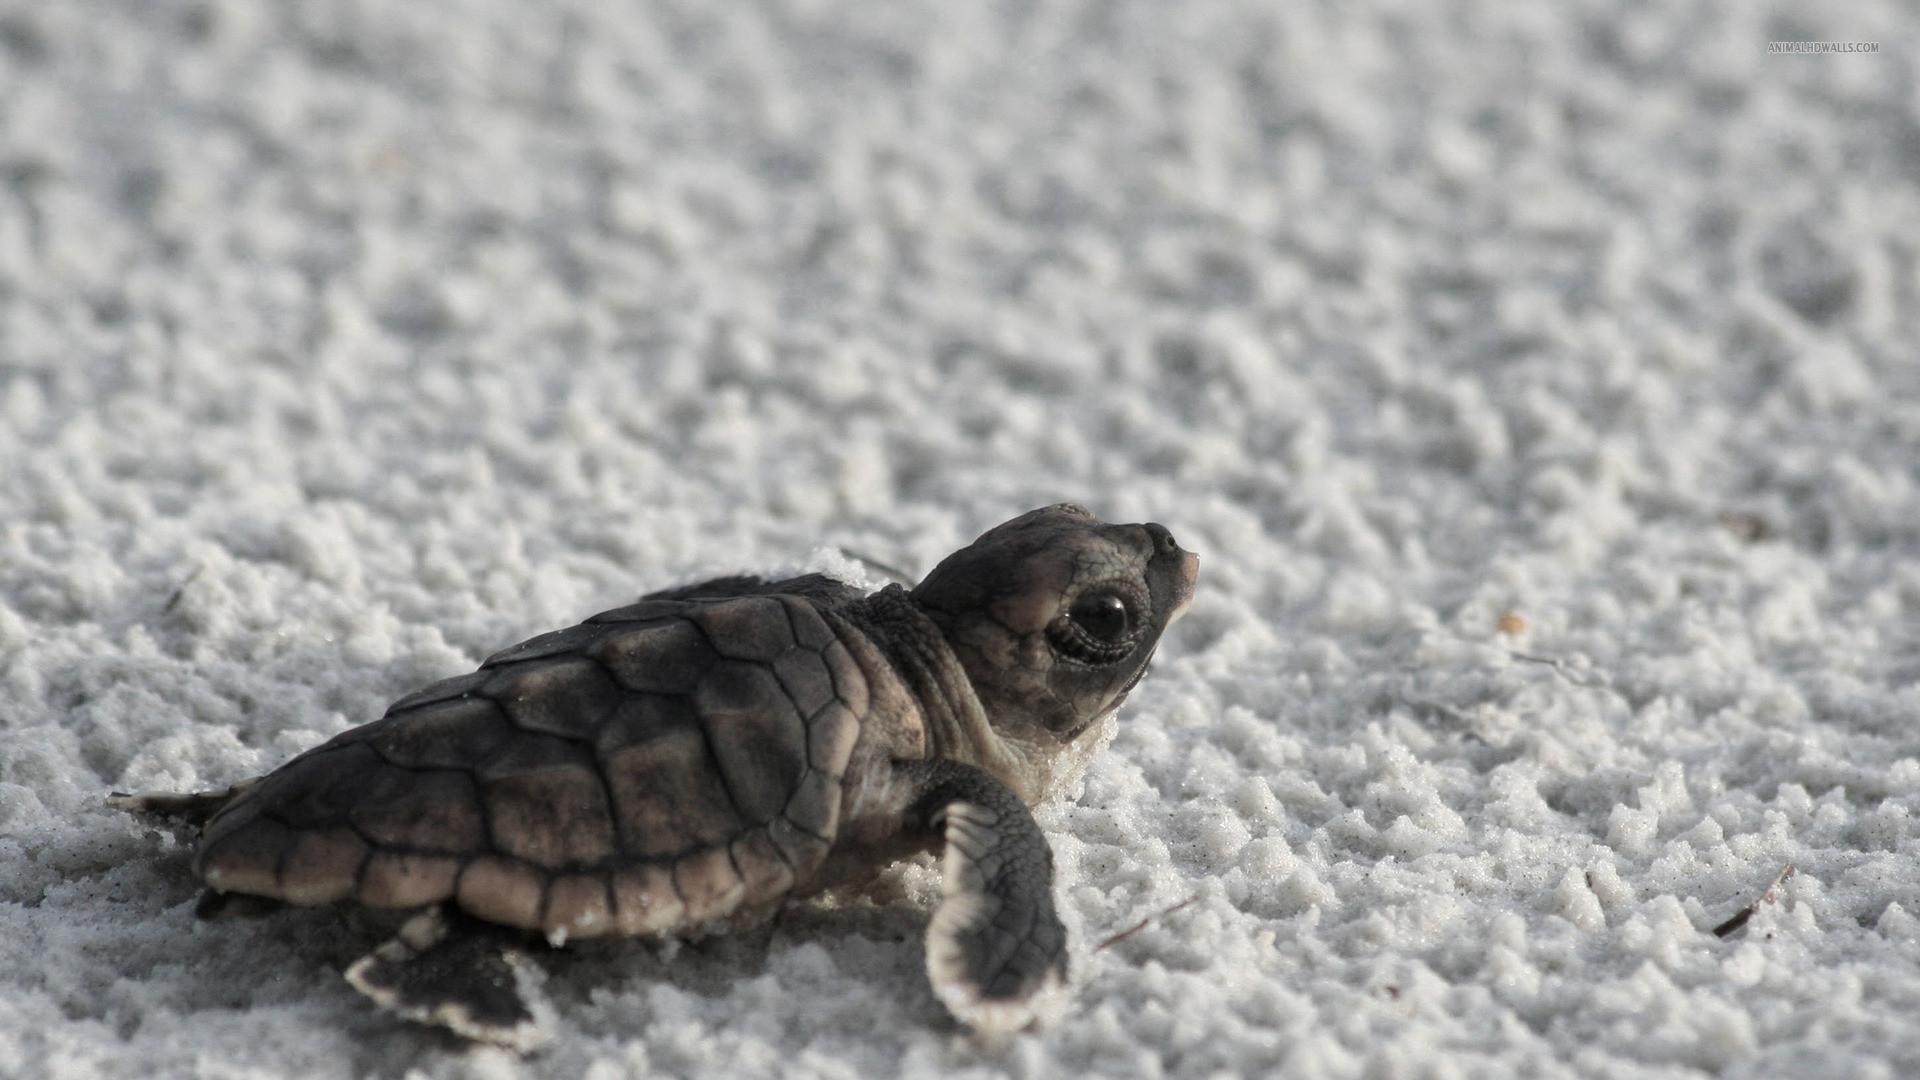 Bing Baby Turtle wallpapers (63 Wallpapers)